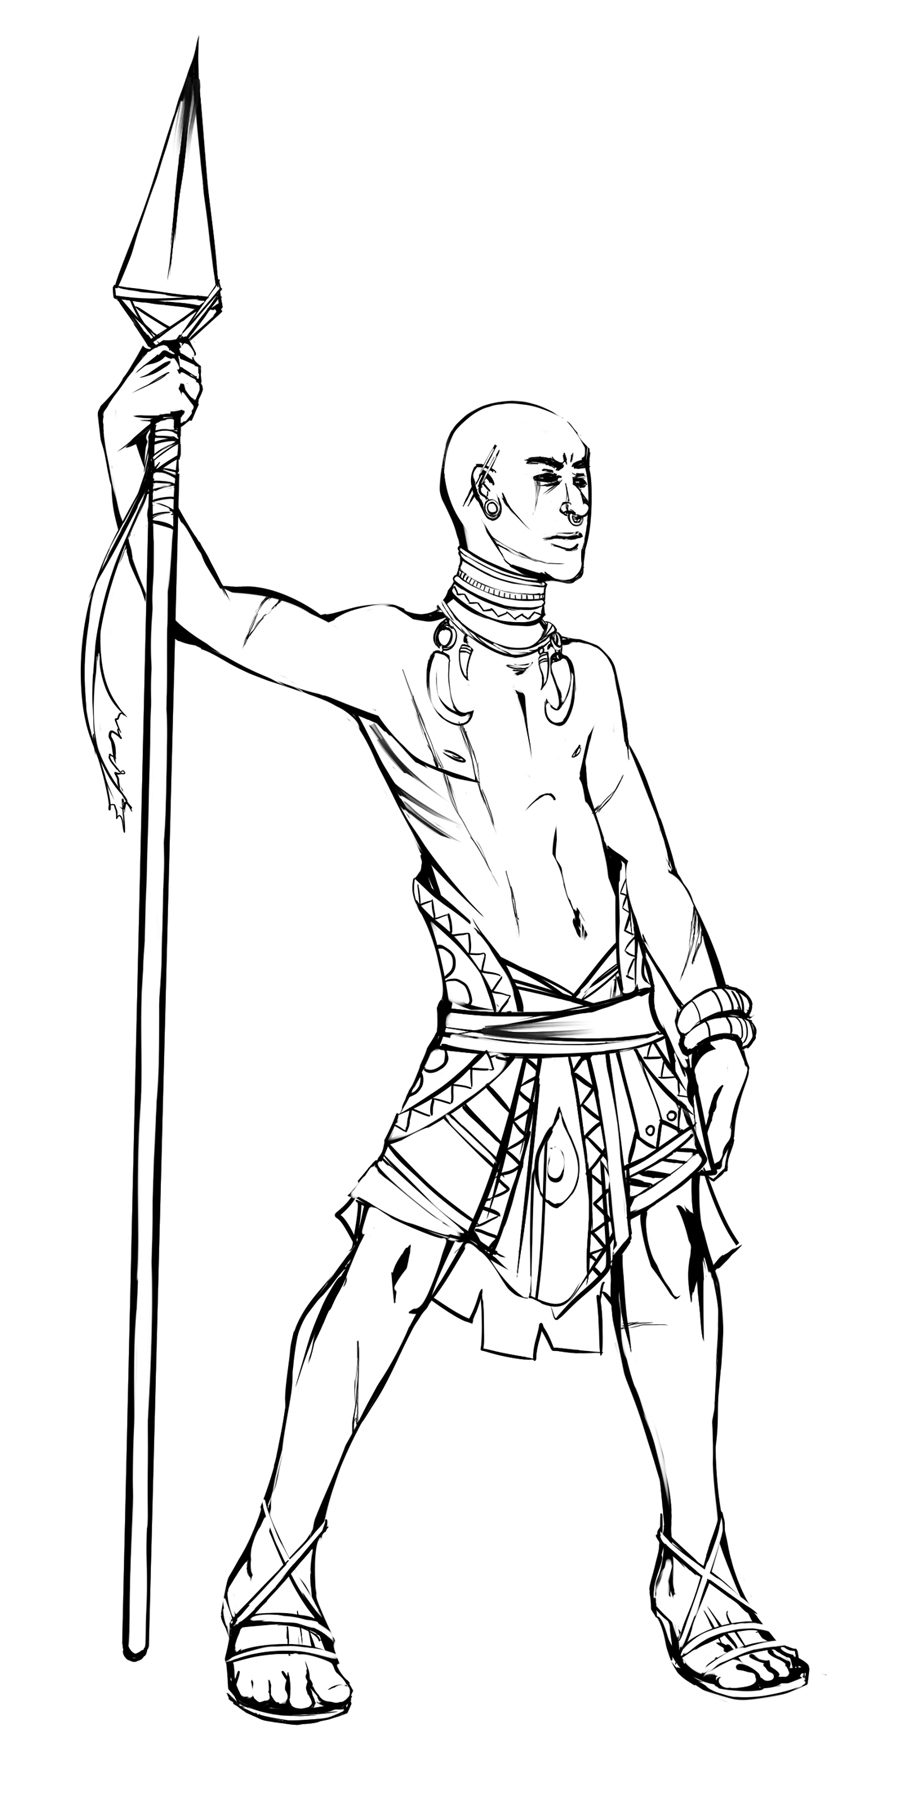 Rhamka Tribal Warrior - Inicial Sketches